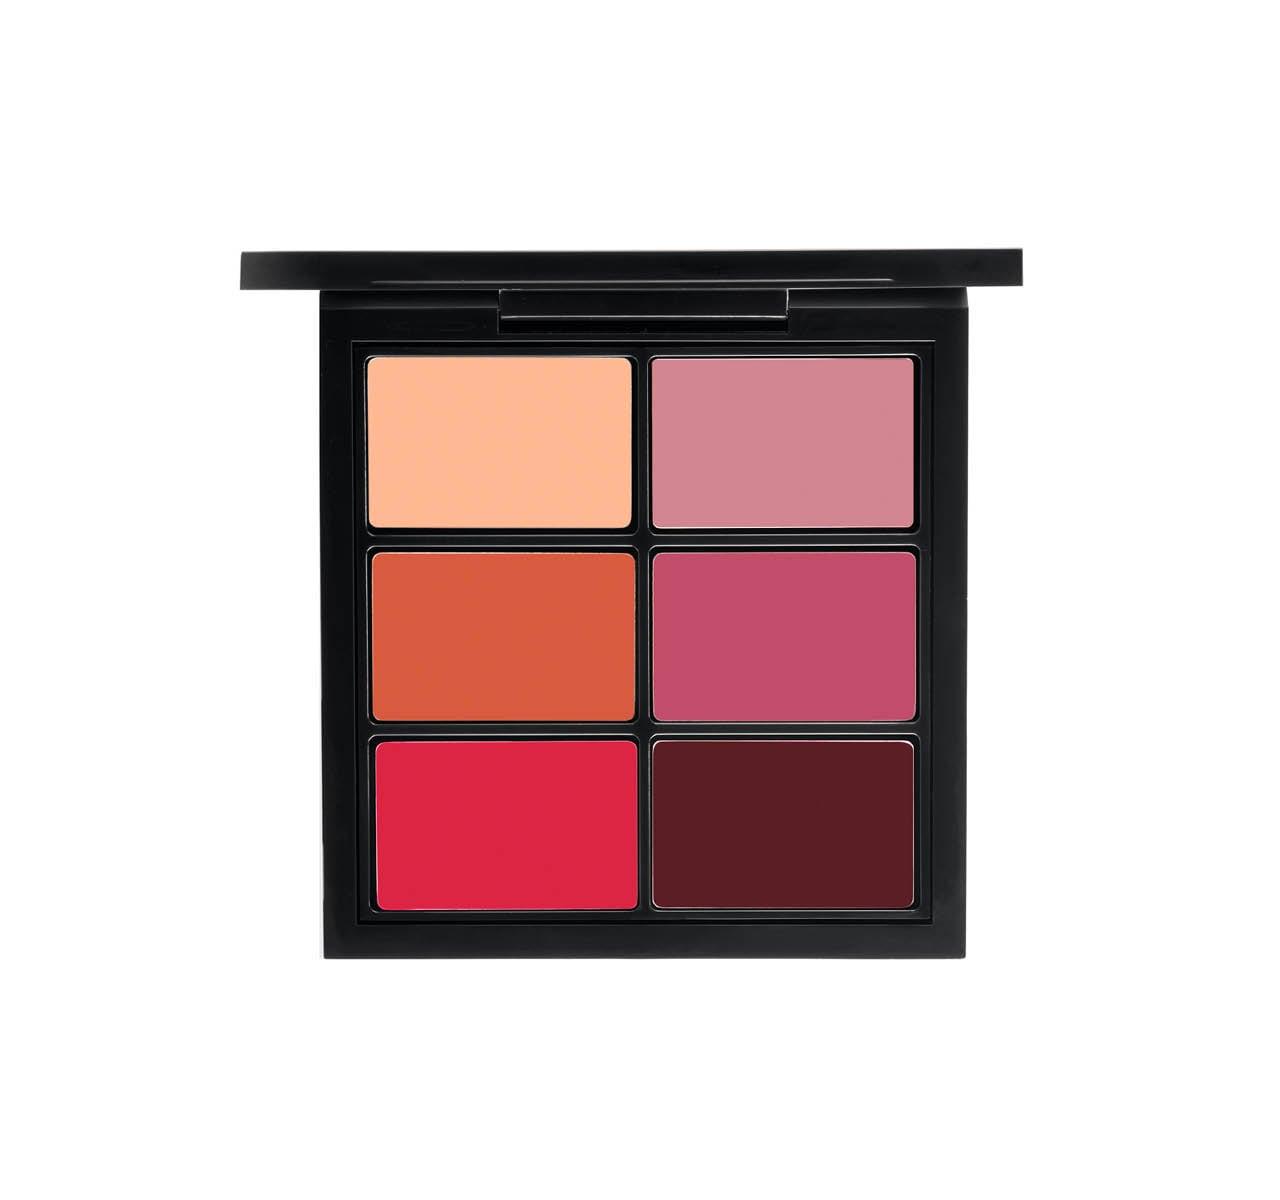 Colour care london lipstick price - M A C Trend Forecast Fall 16 Lip